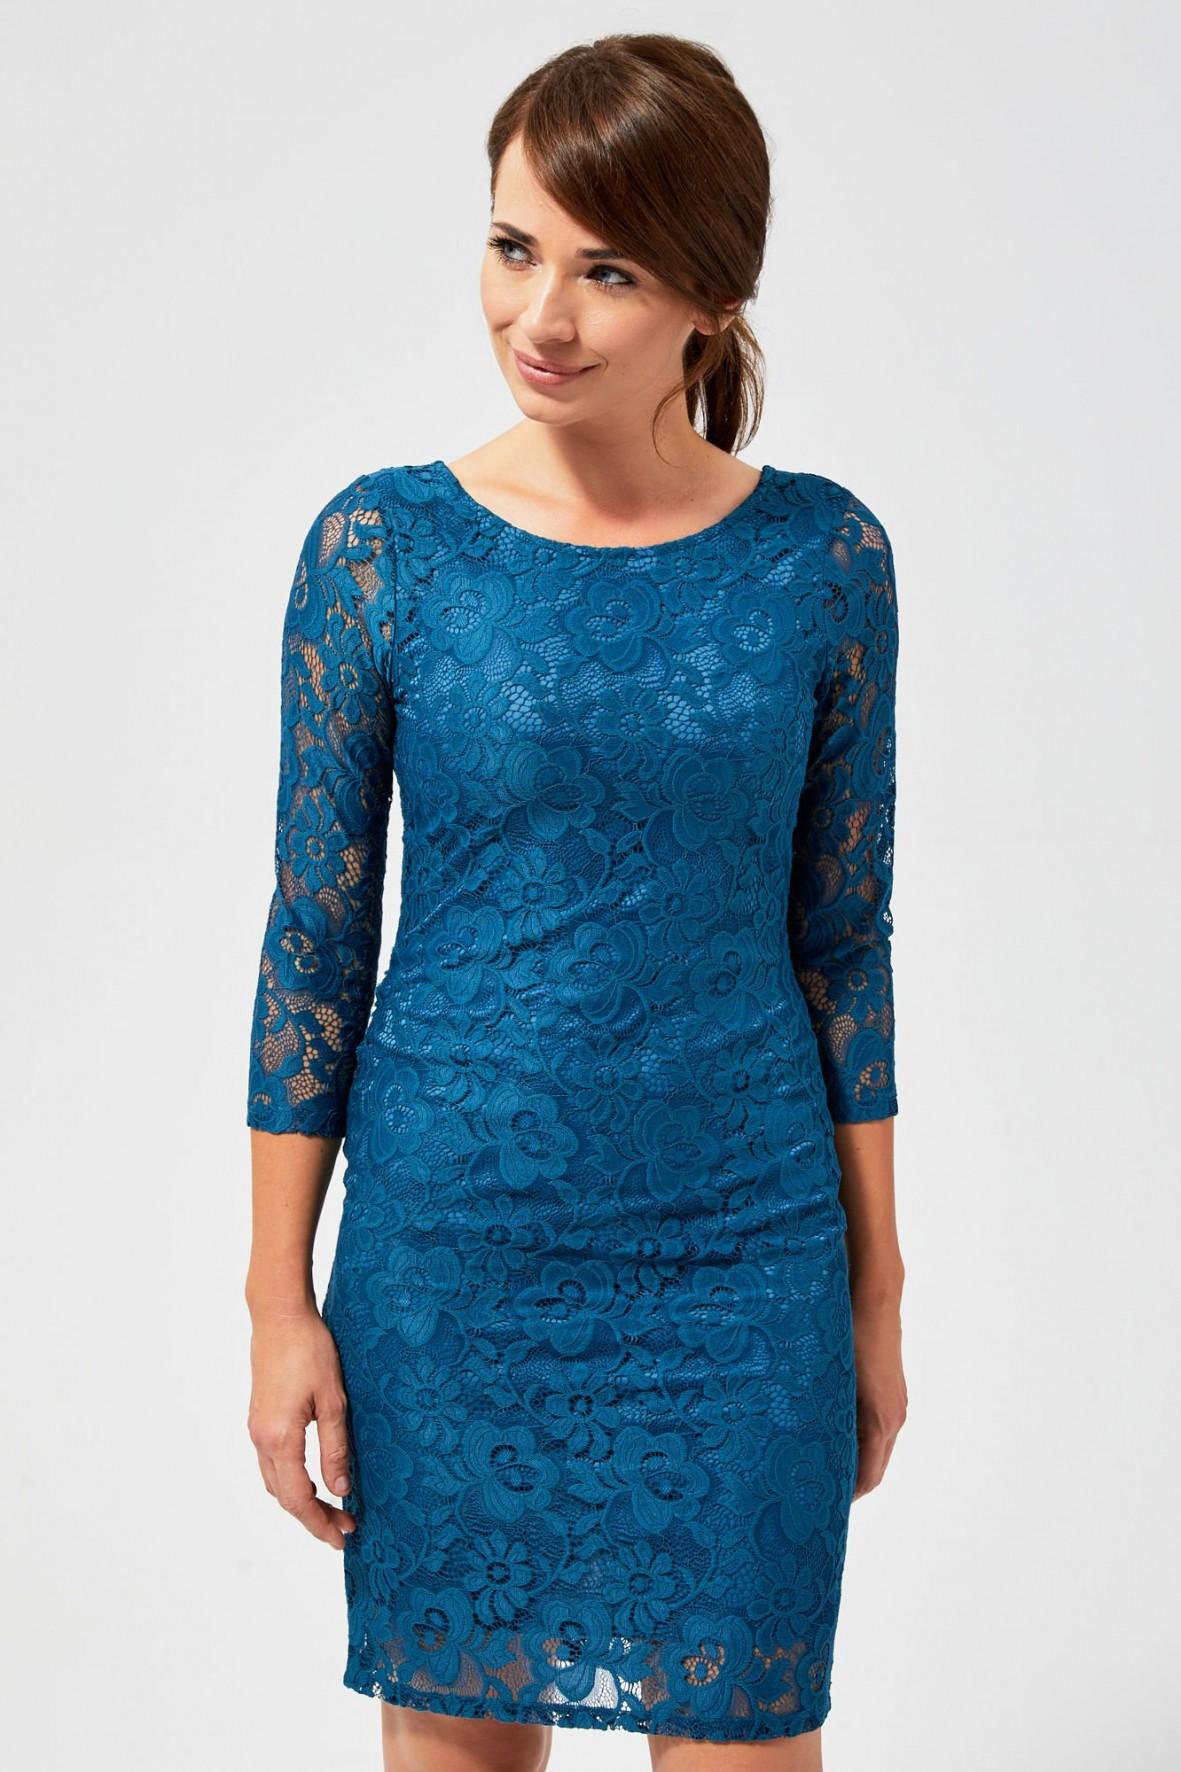 Koronkowa sukienka damska- turkusowa